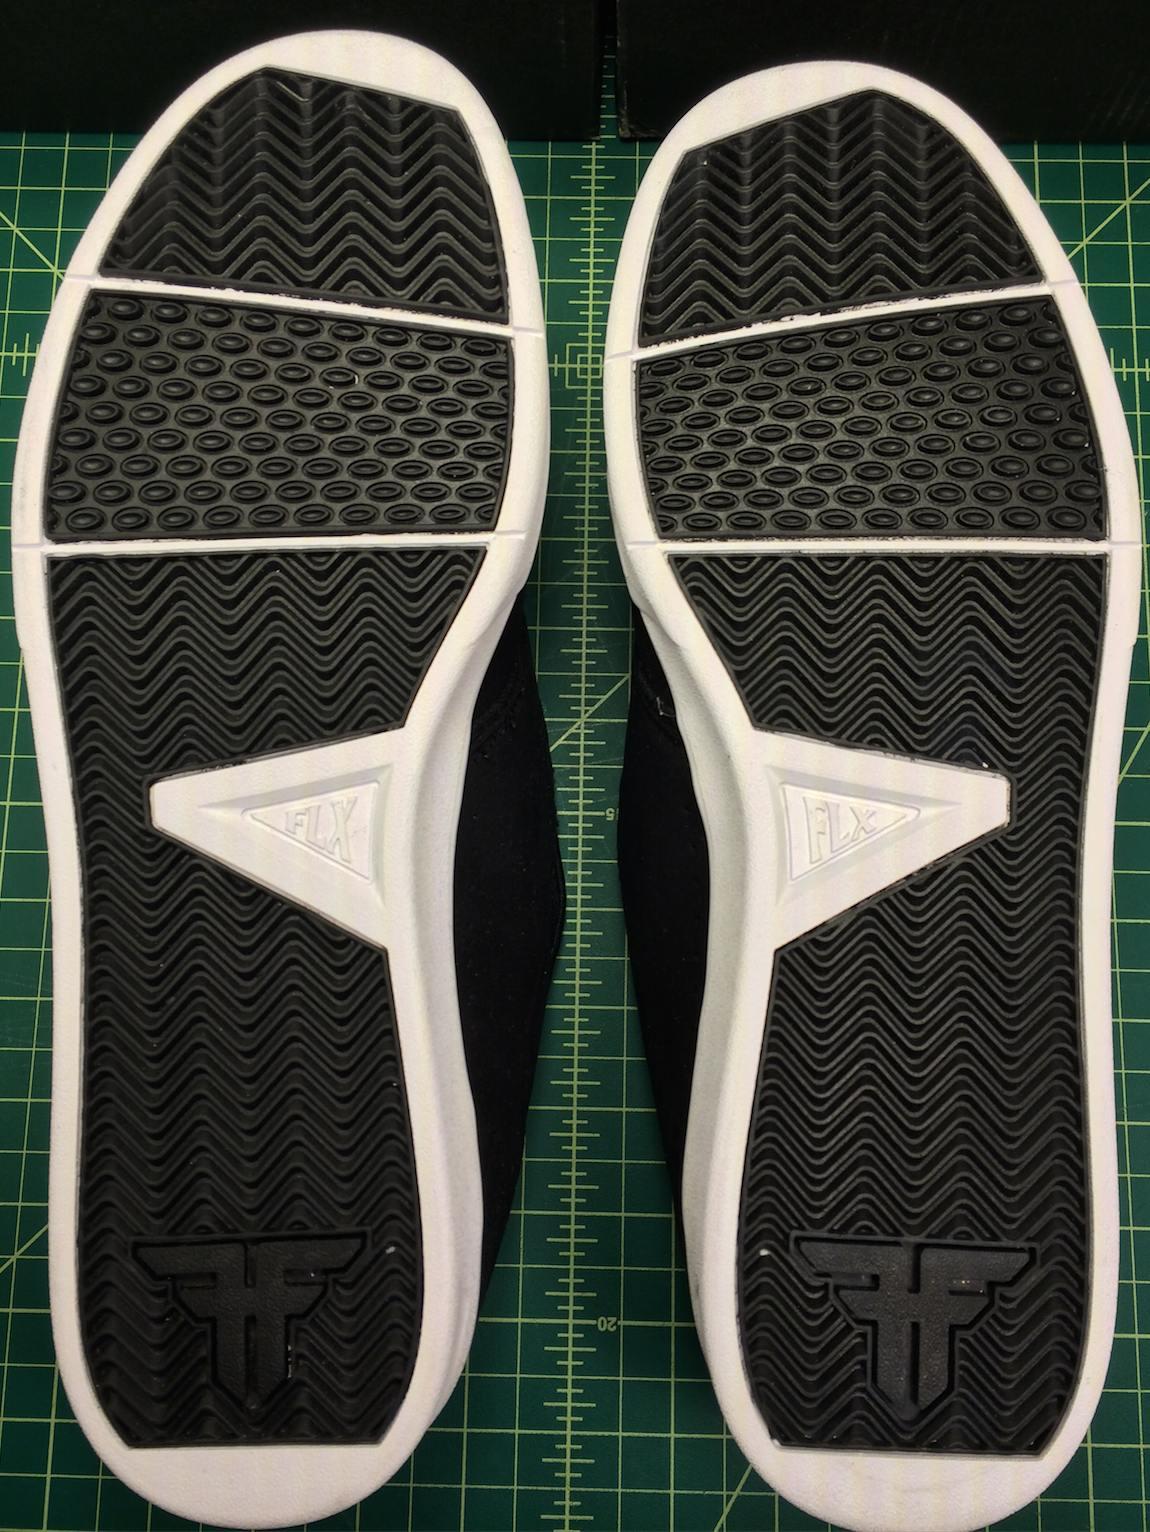 Fallen the vibe FLX soles slim cupsole vegan skateboard shoe